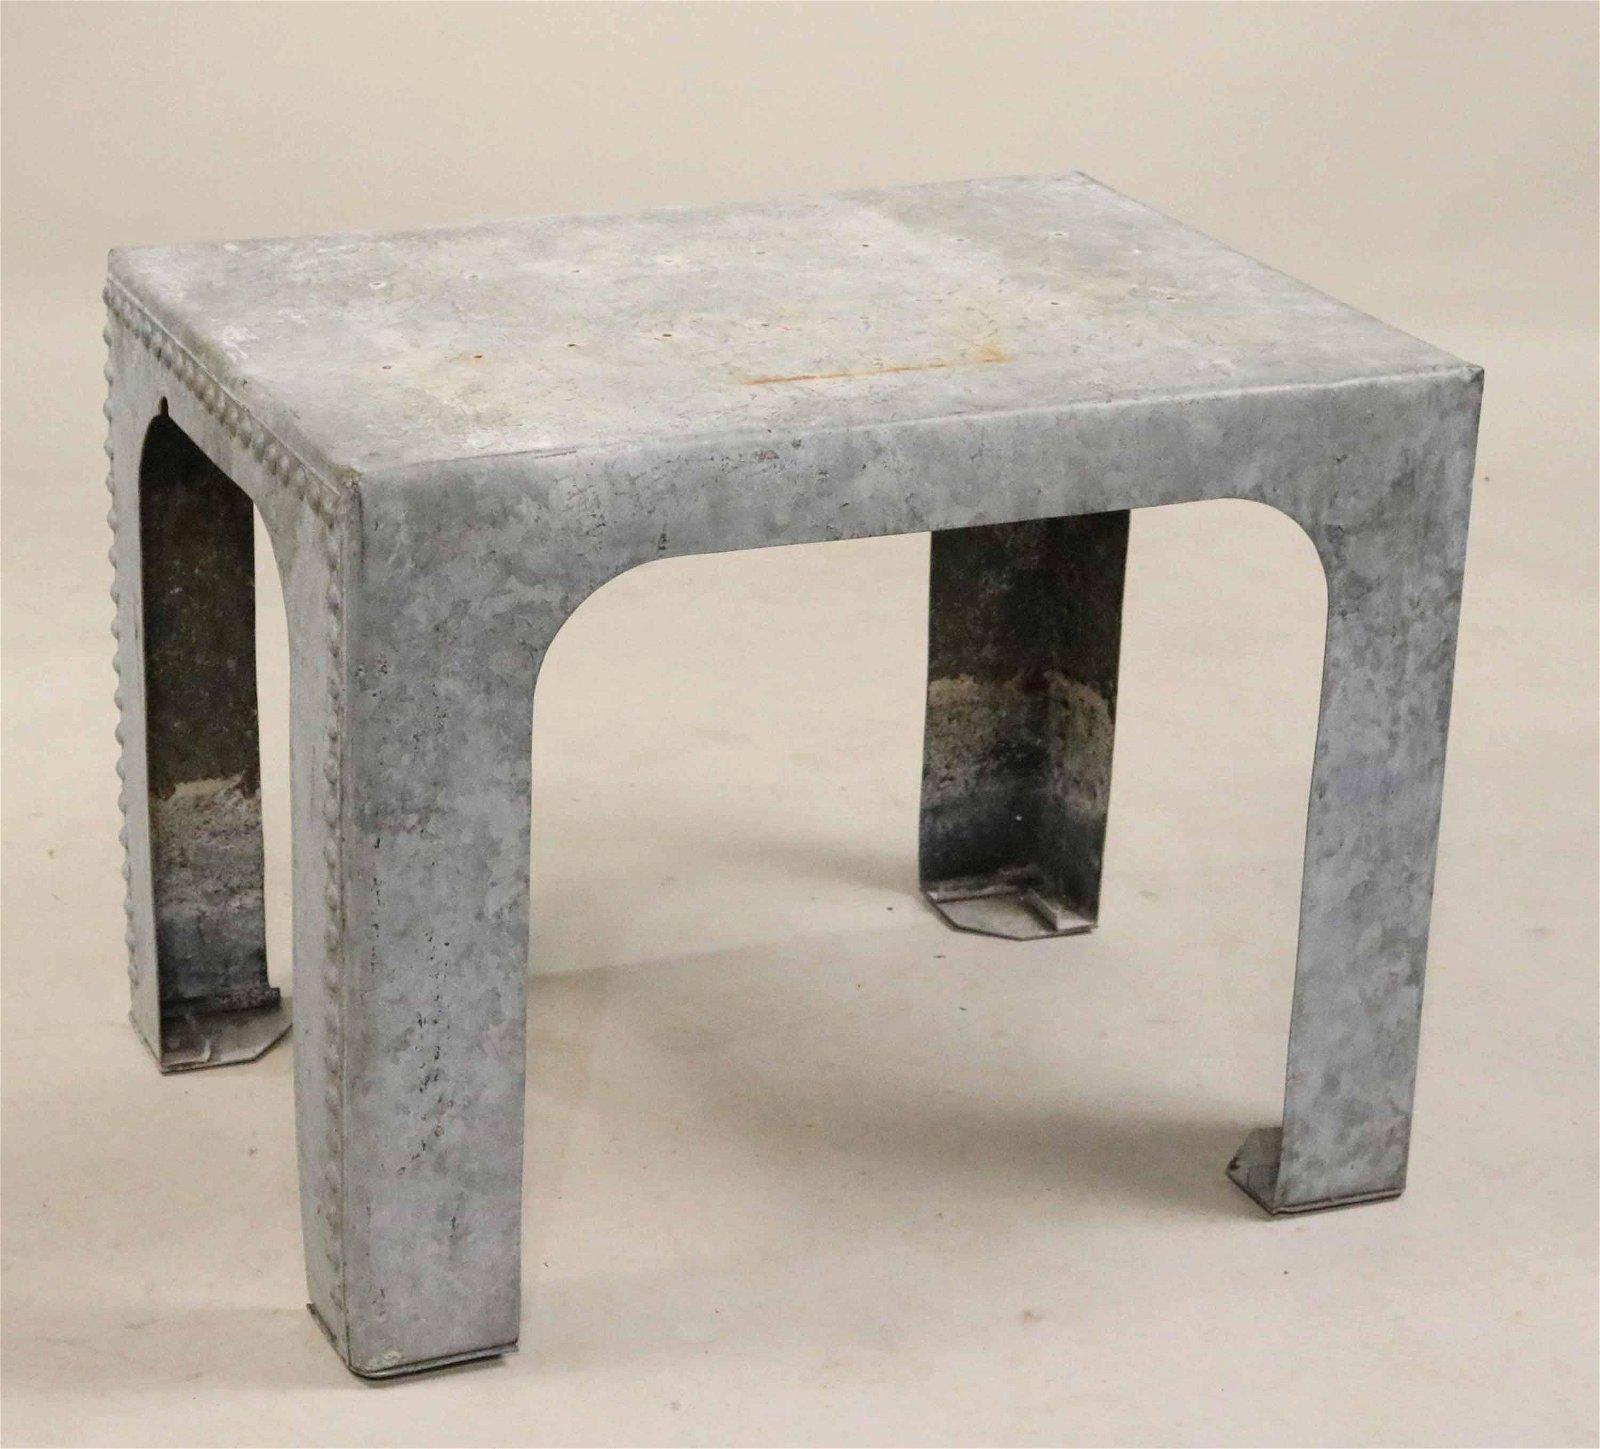 Galvanized Steel Side Table